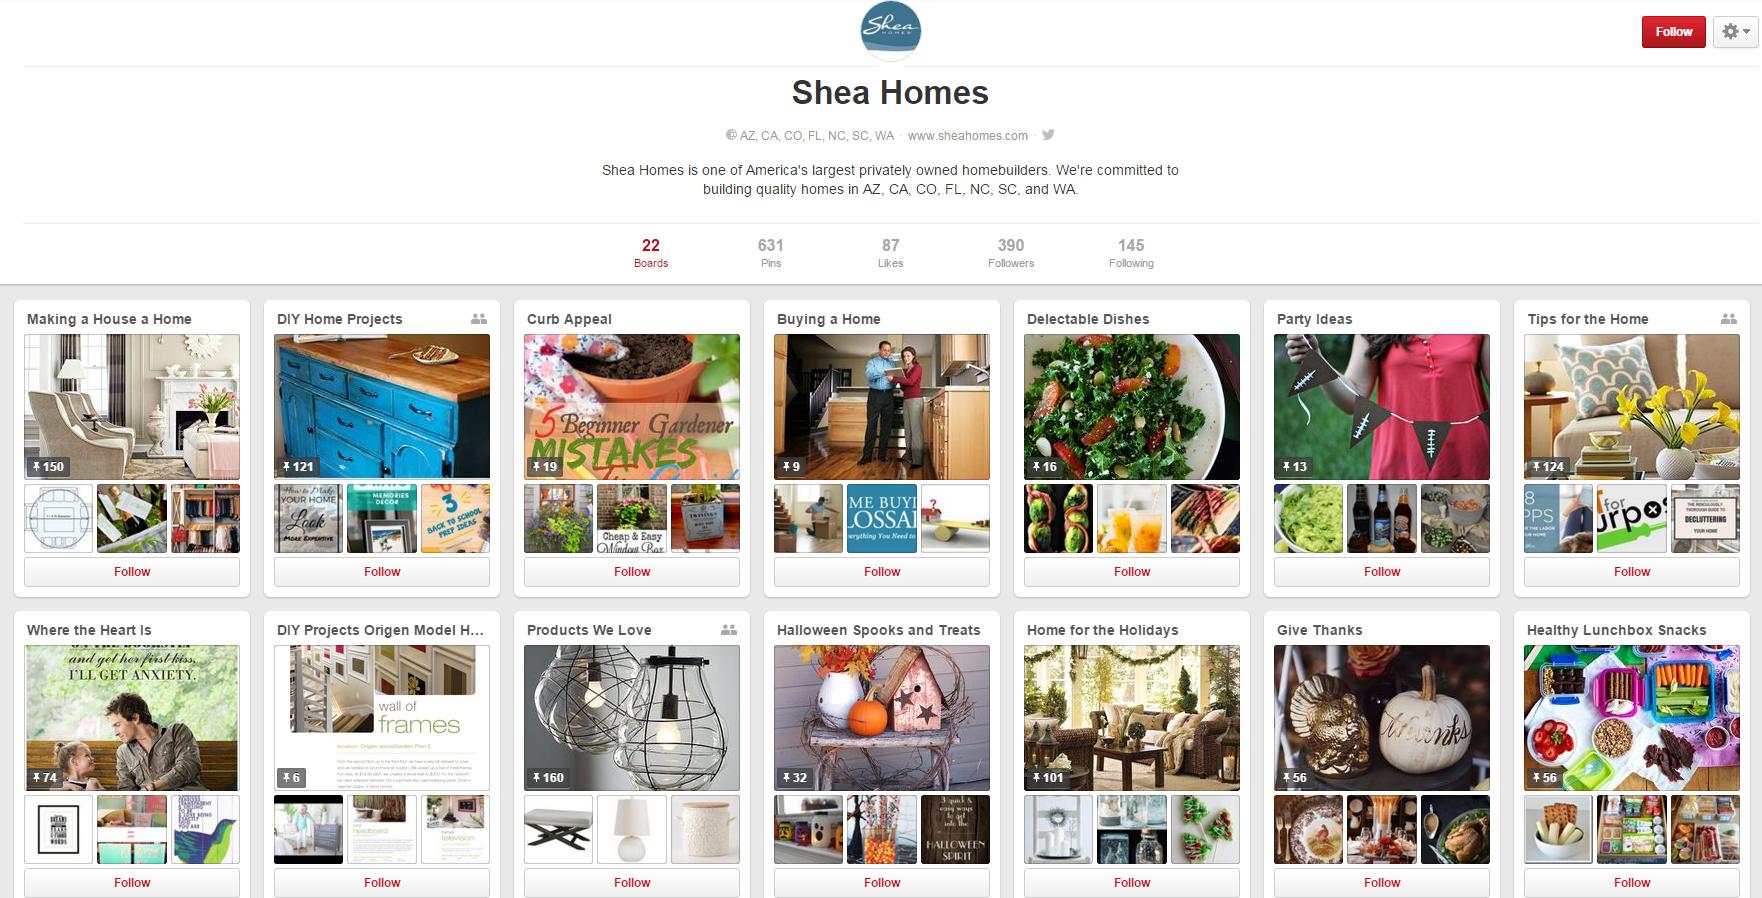 shea-homes-pinterest.png